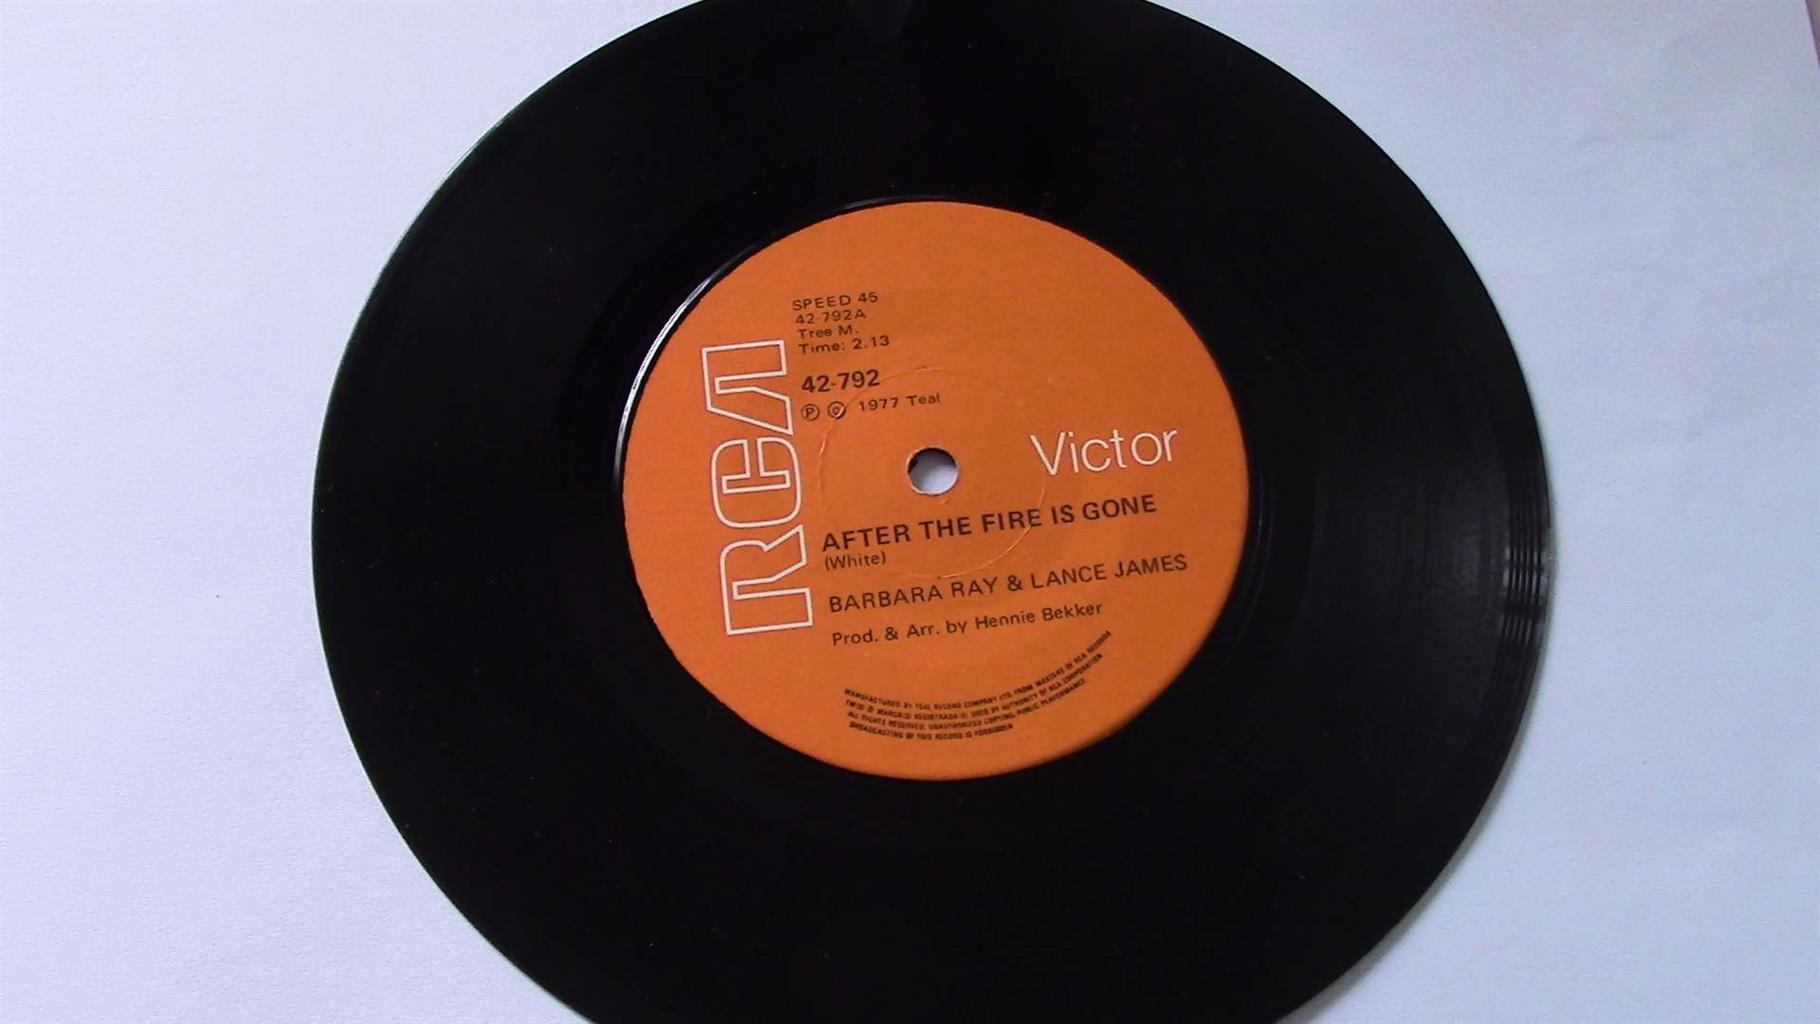 Vinyl Seven Singles oldies (1 - 10)